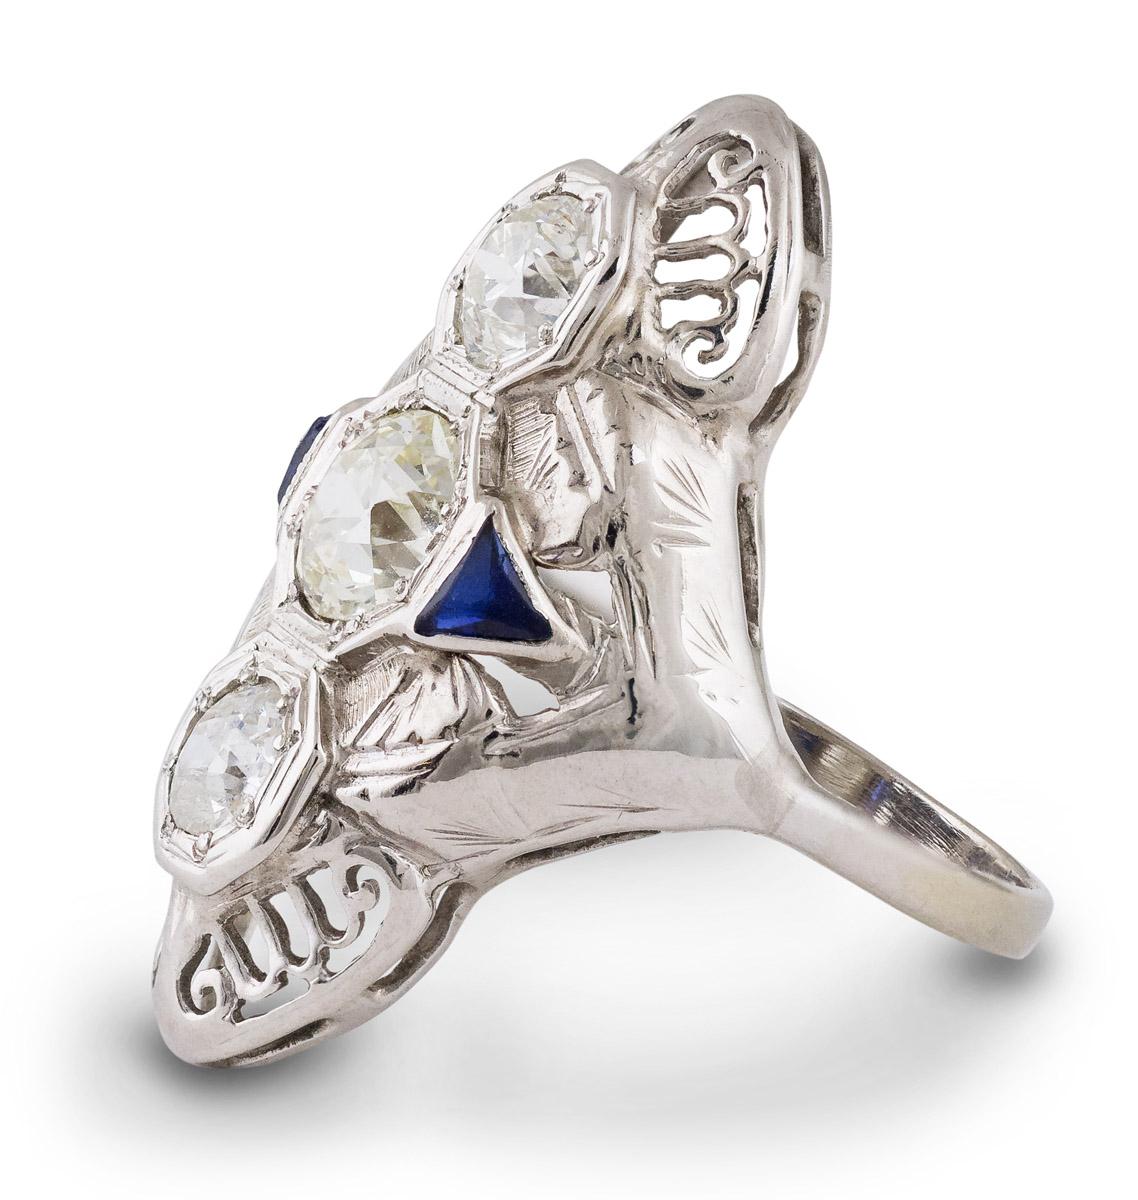 Vintage Filigree Diamond and Sapphire Ring - Side